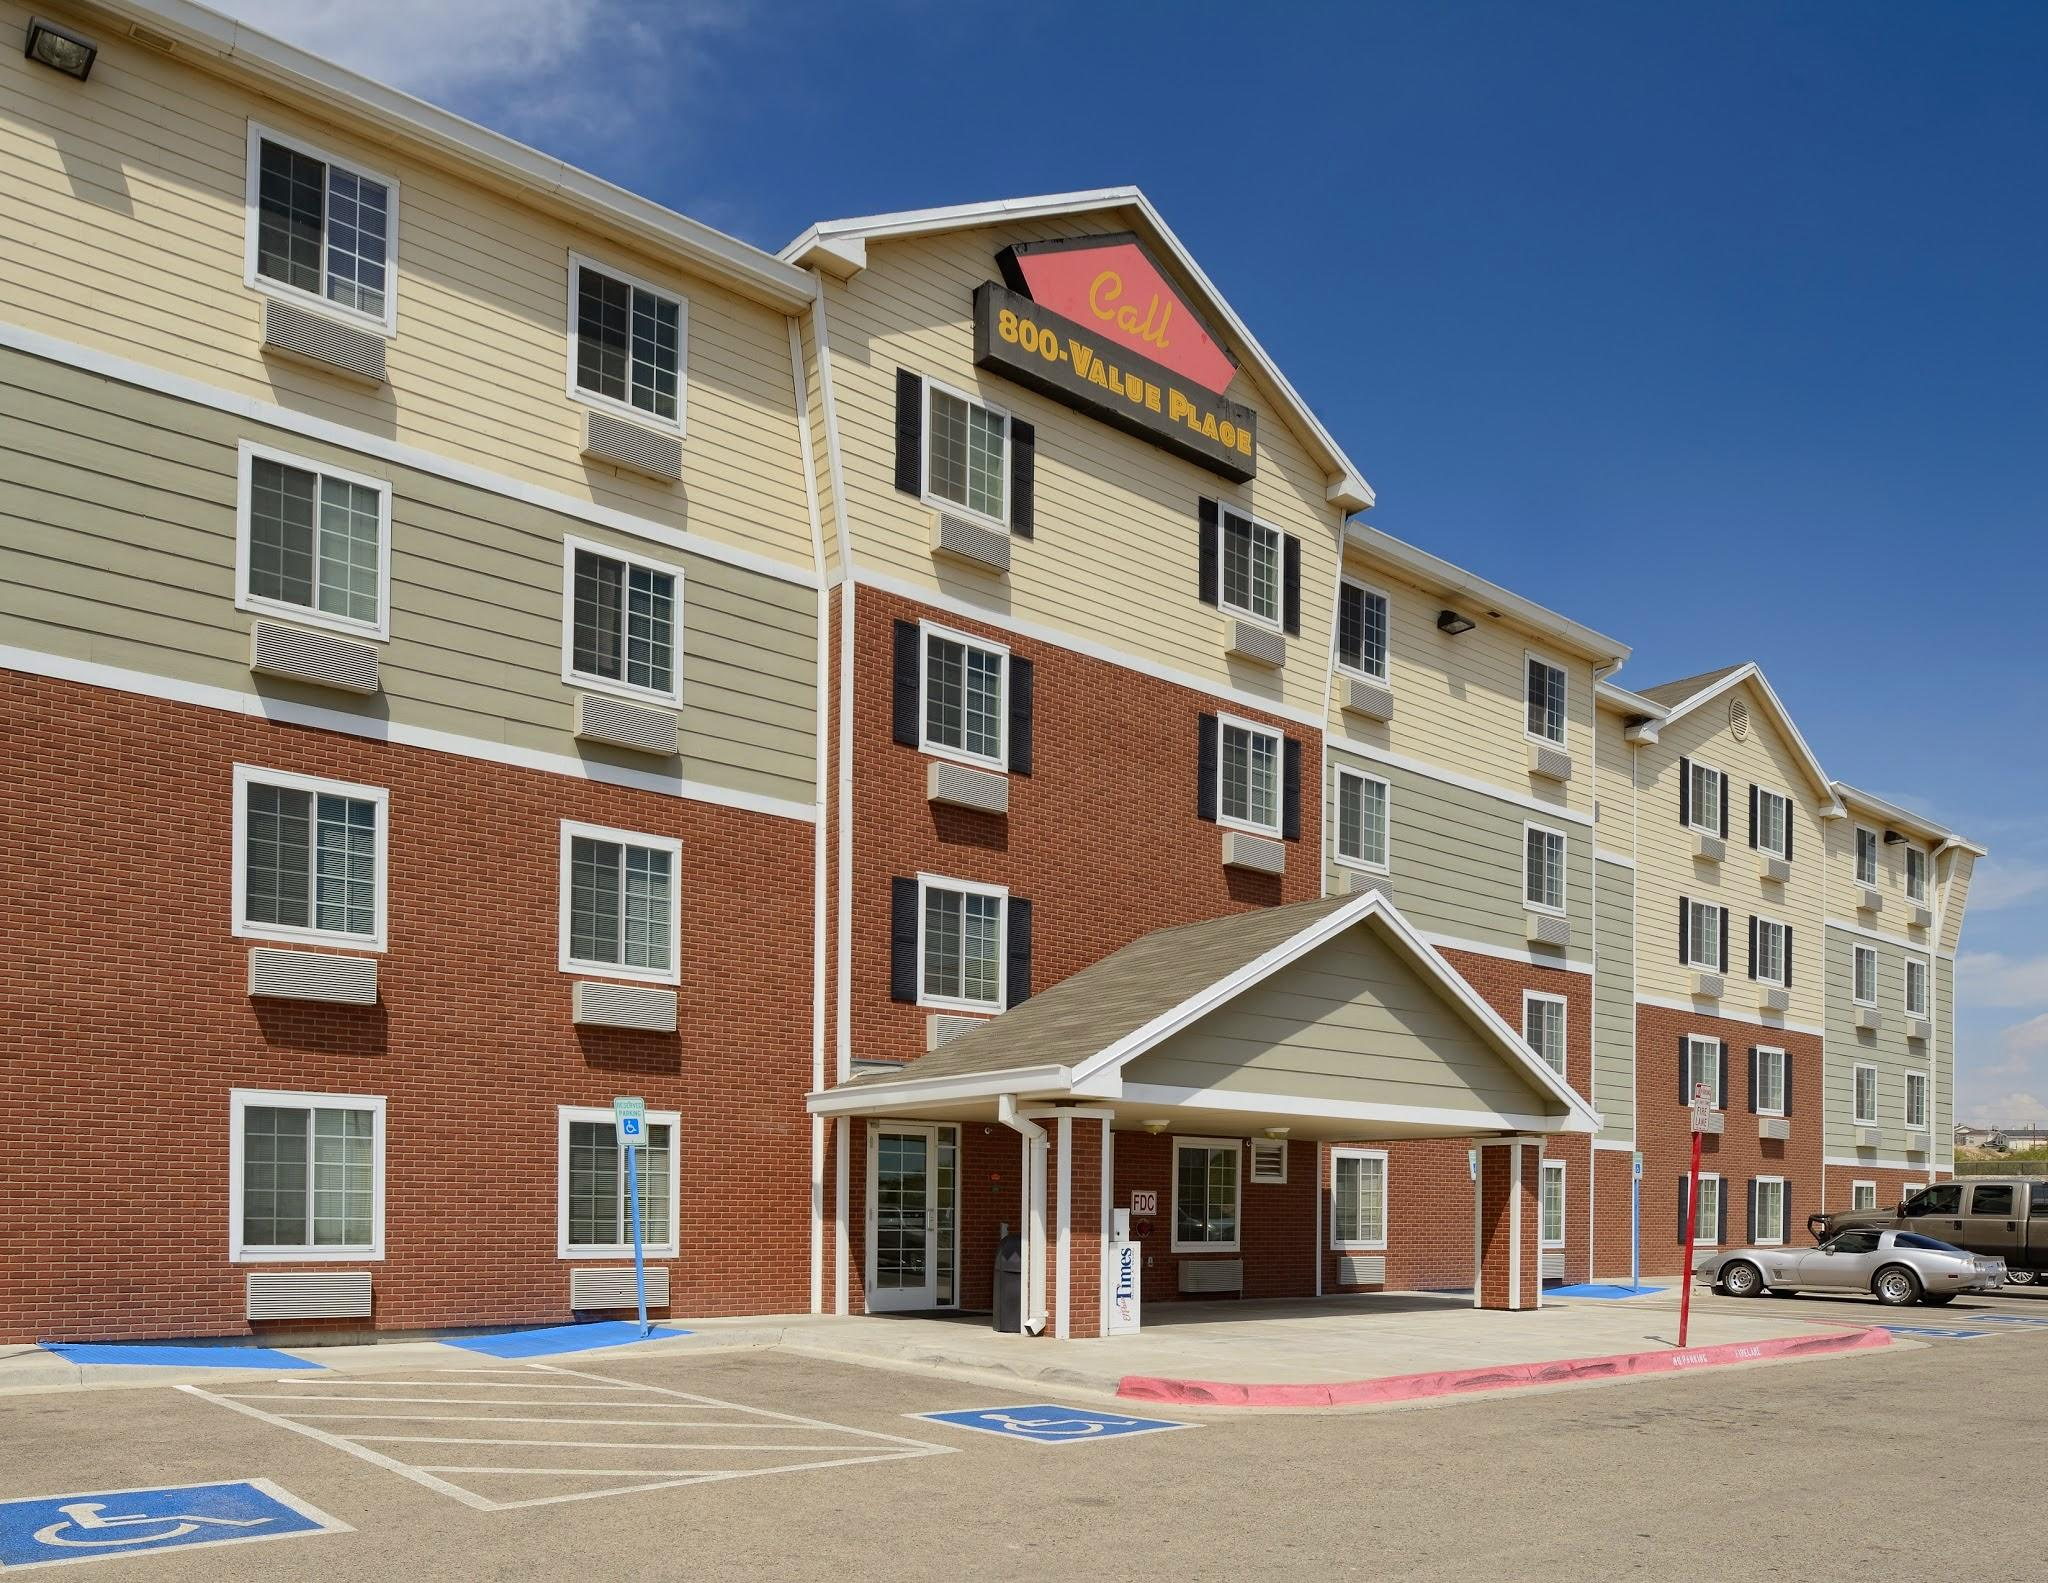 Value Place El Paso image 1